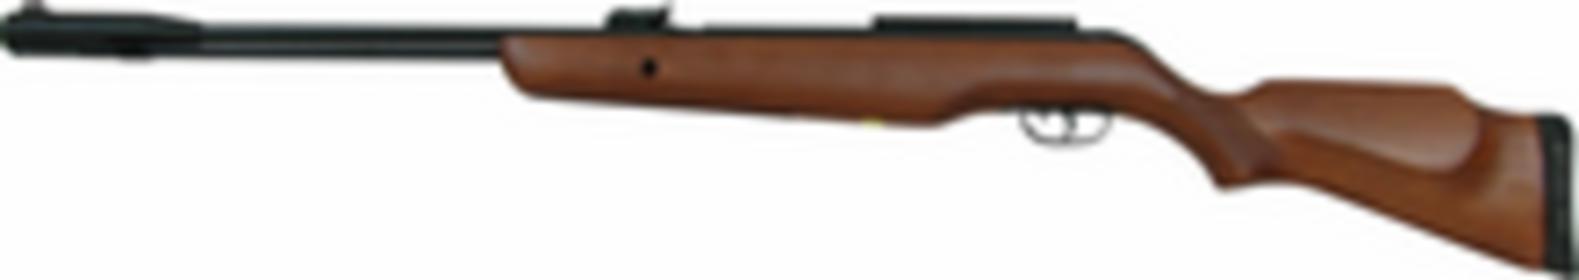 Gamo Wiatrówka CFX Royal 4,5 mm (6110015-16J)